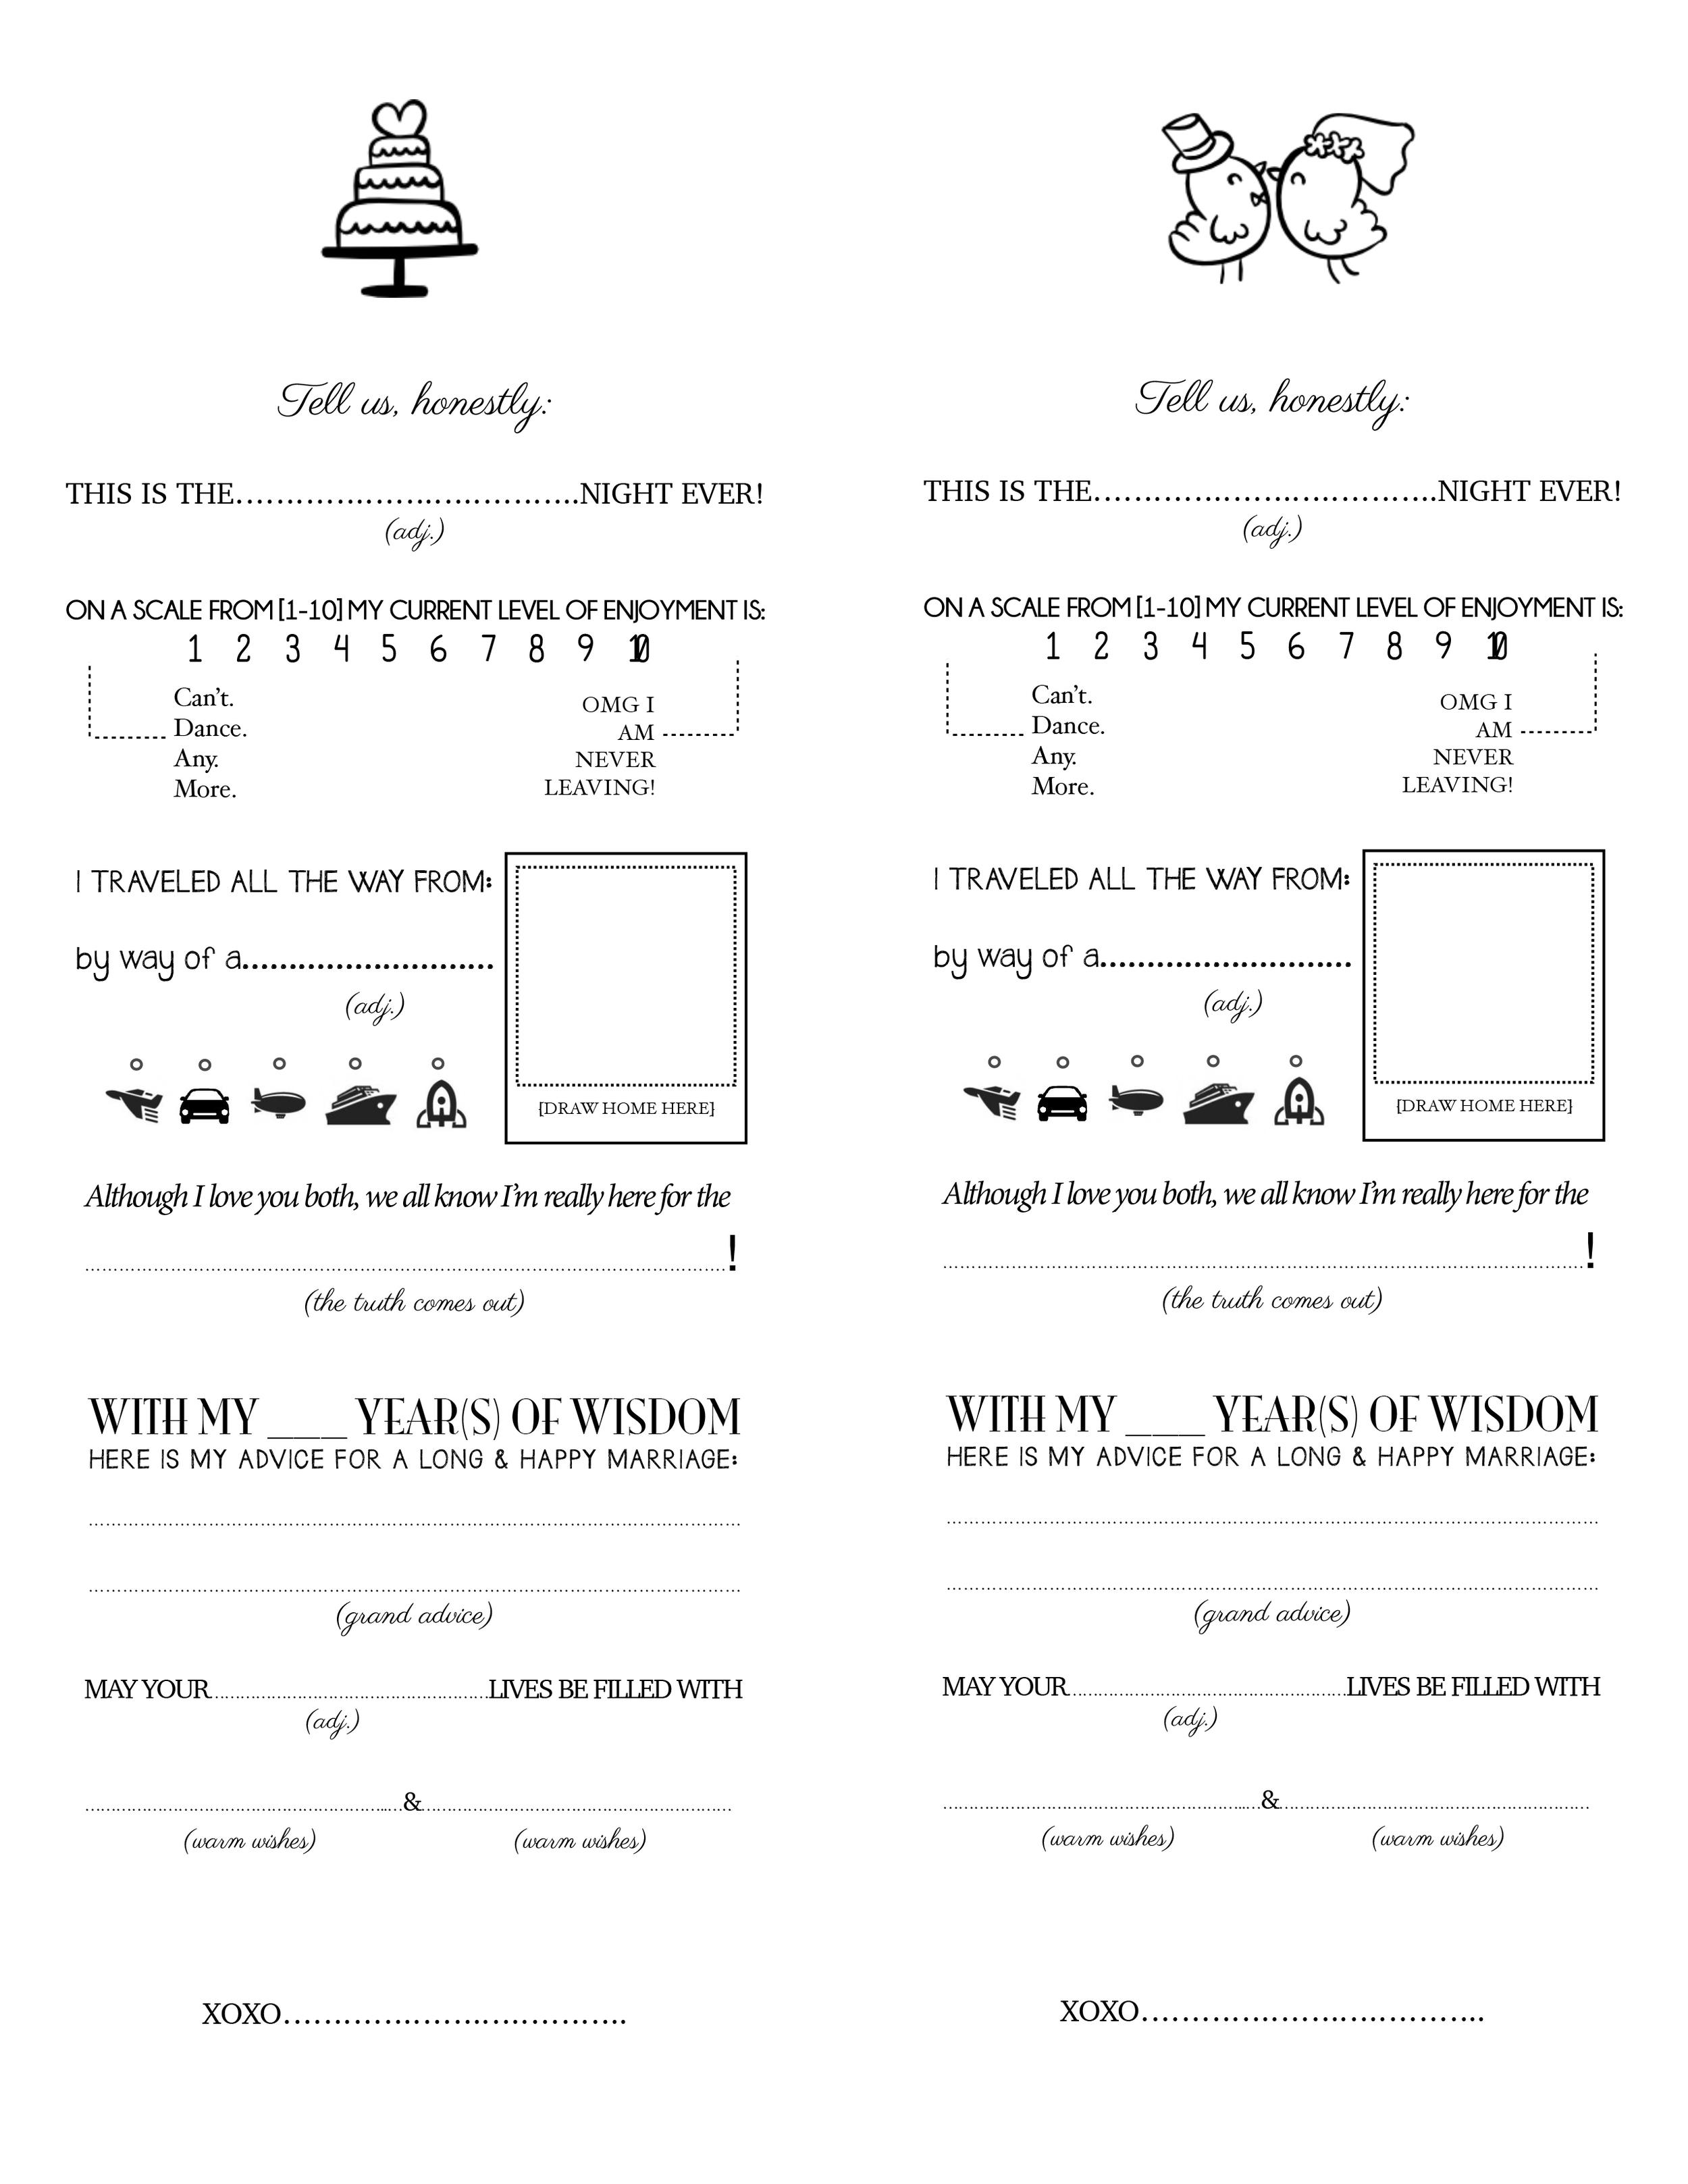 Free Printable: Mad-Lib Survey for Wedding Guests!